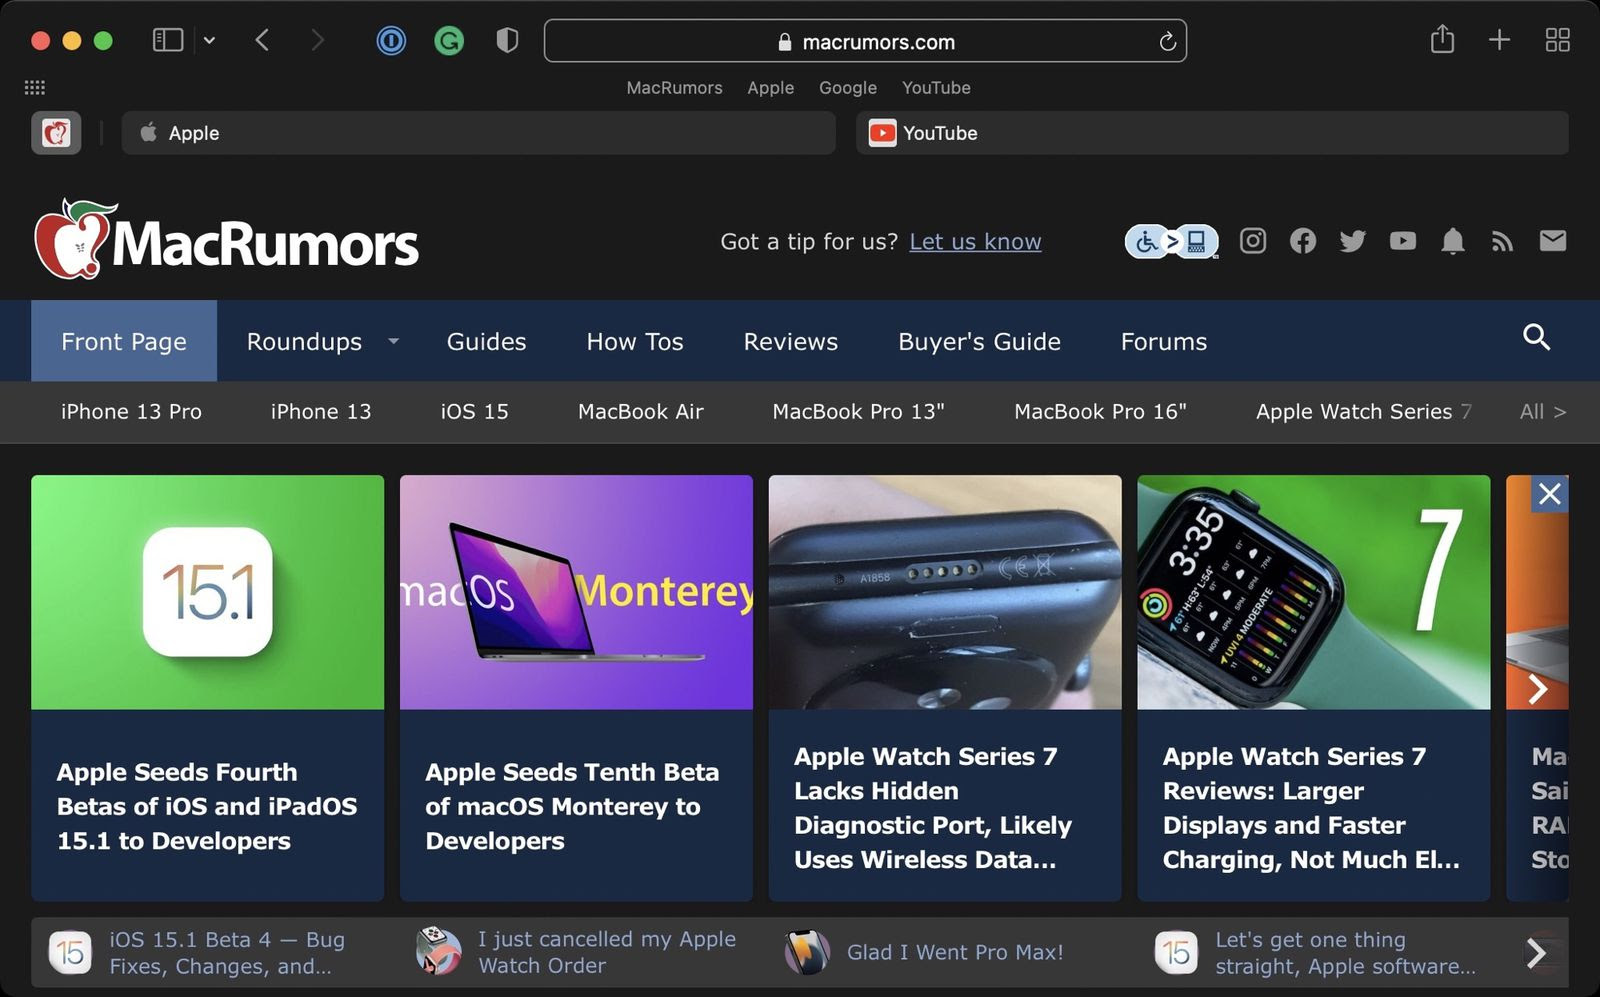 Apple Releases macOS Big Sur Safari 15.1 Beta With Relocated Favorites Bar